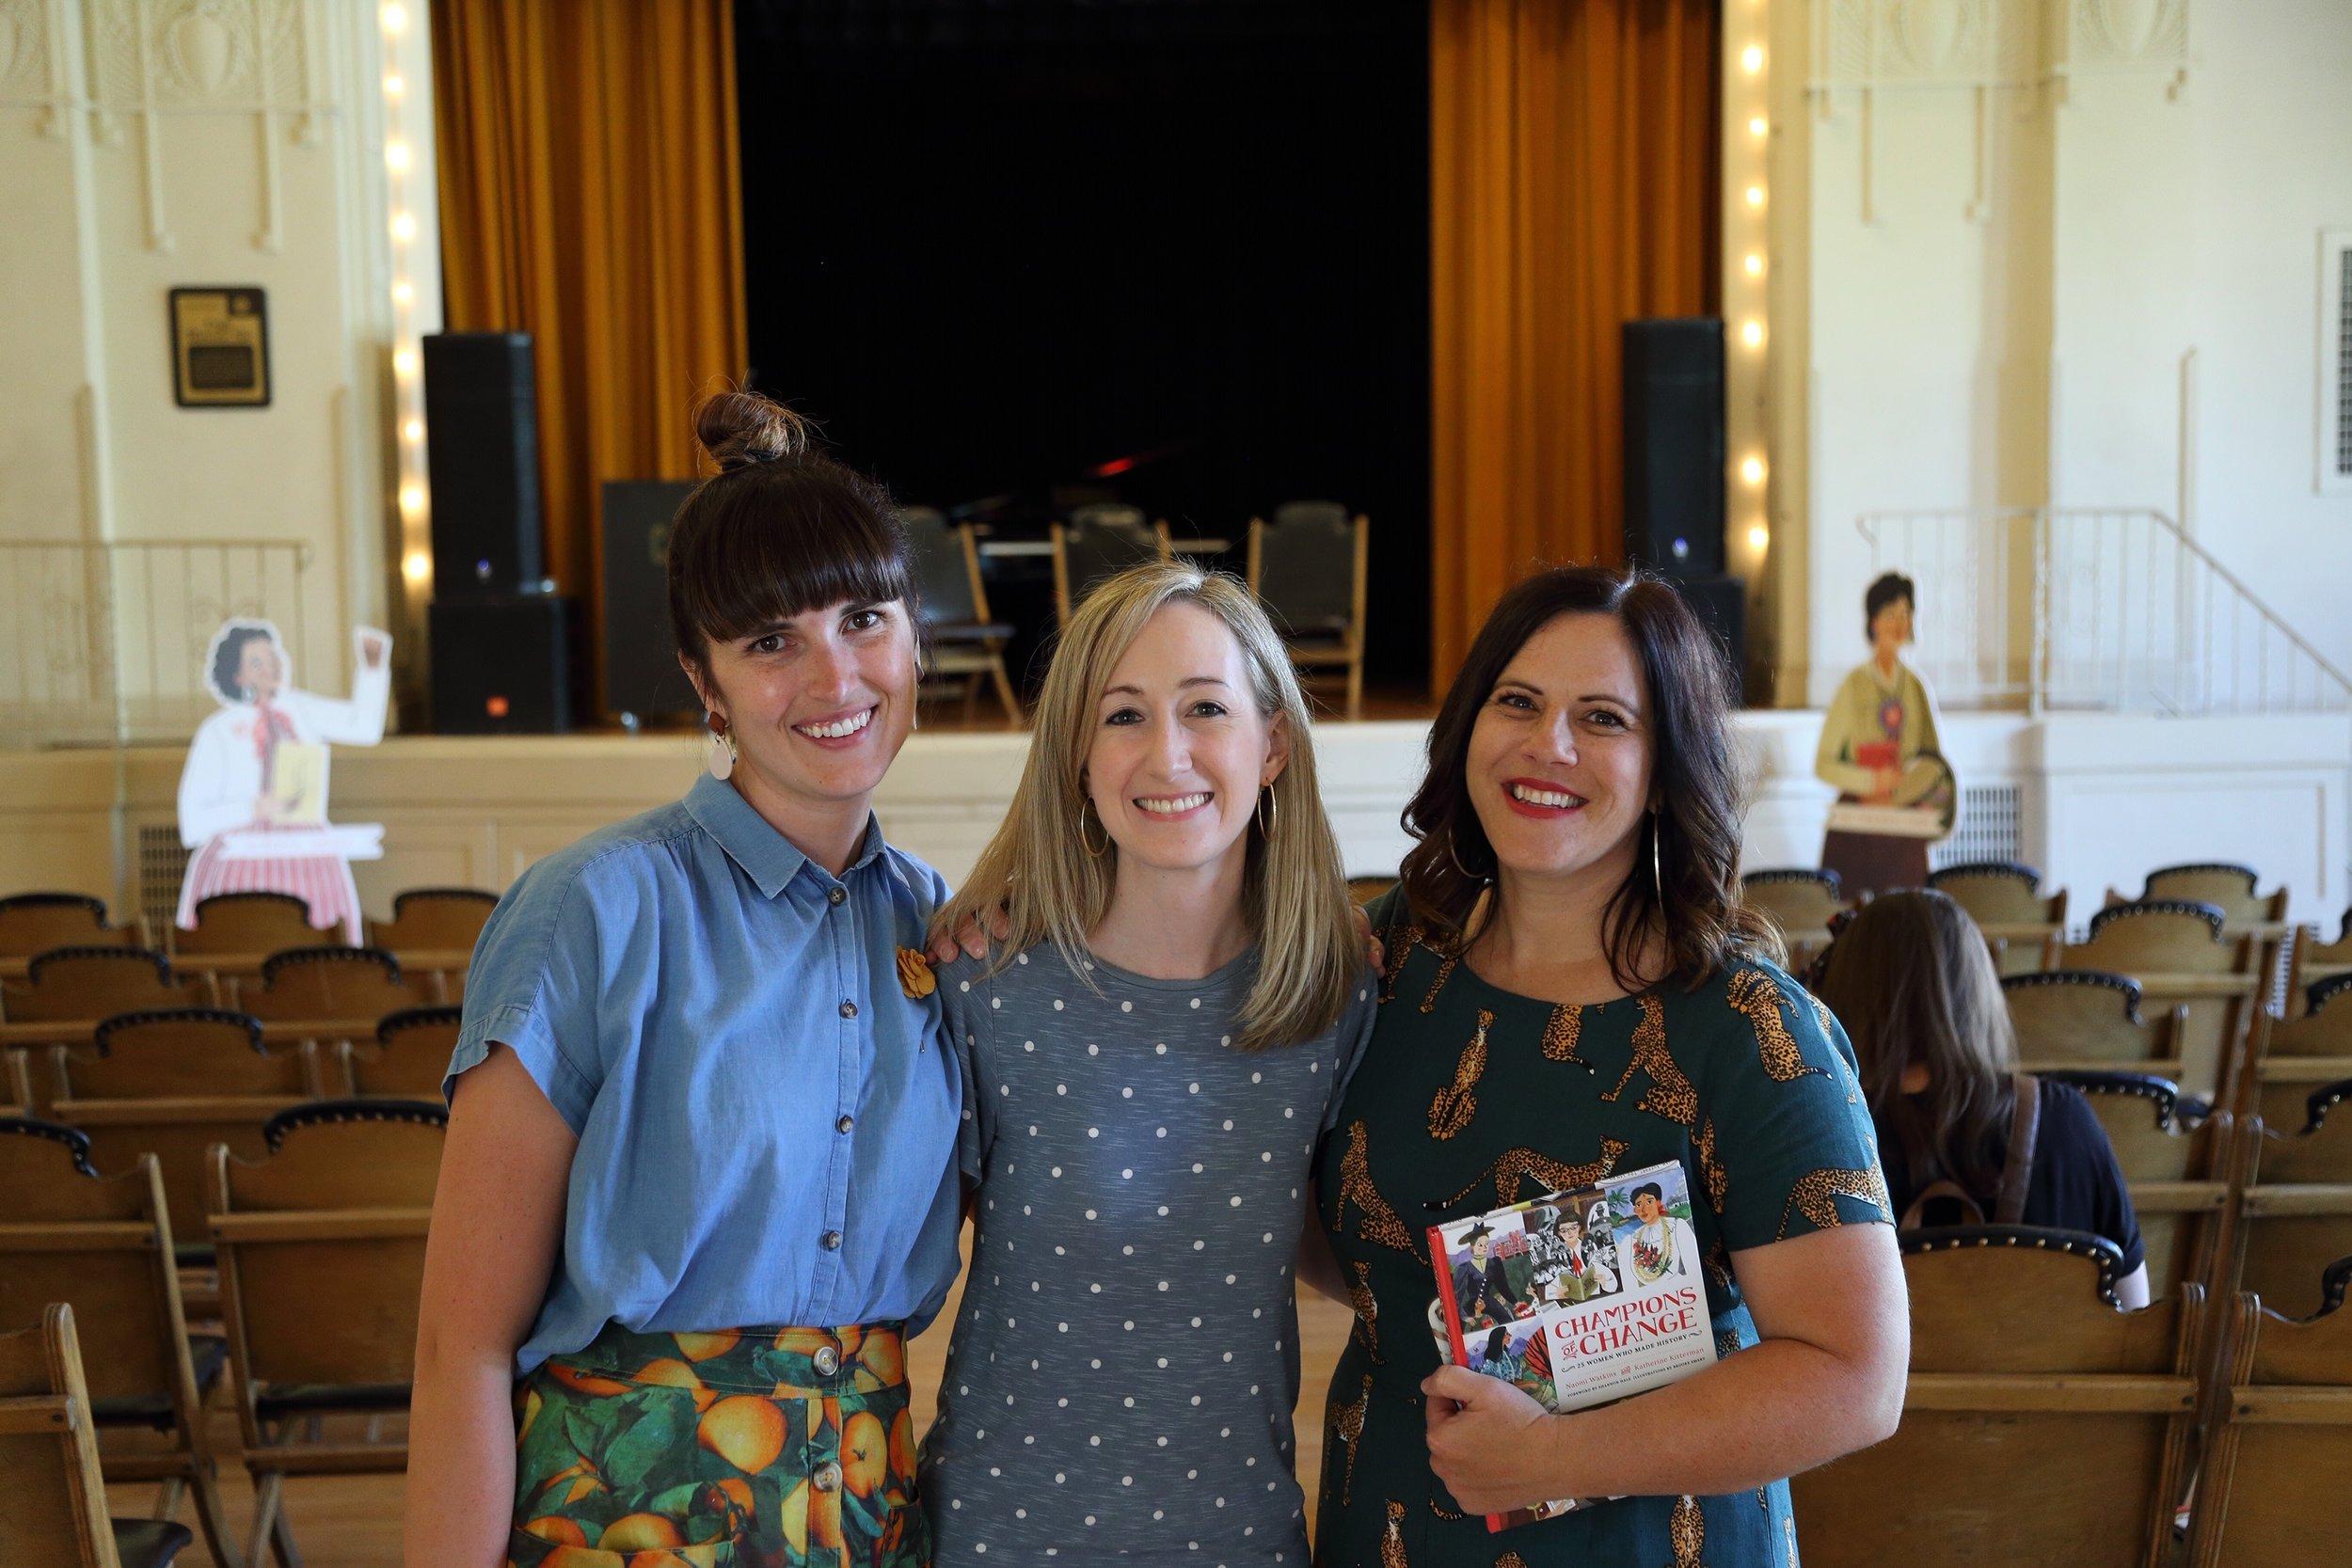 (left to right) Brooke Smart, Katherine Kitterman, and Naomi Watkins